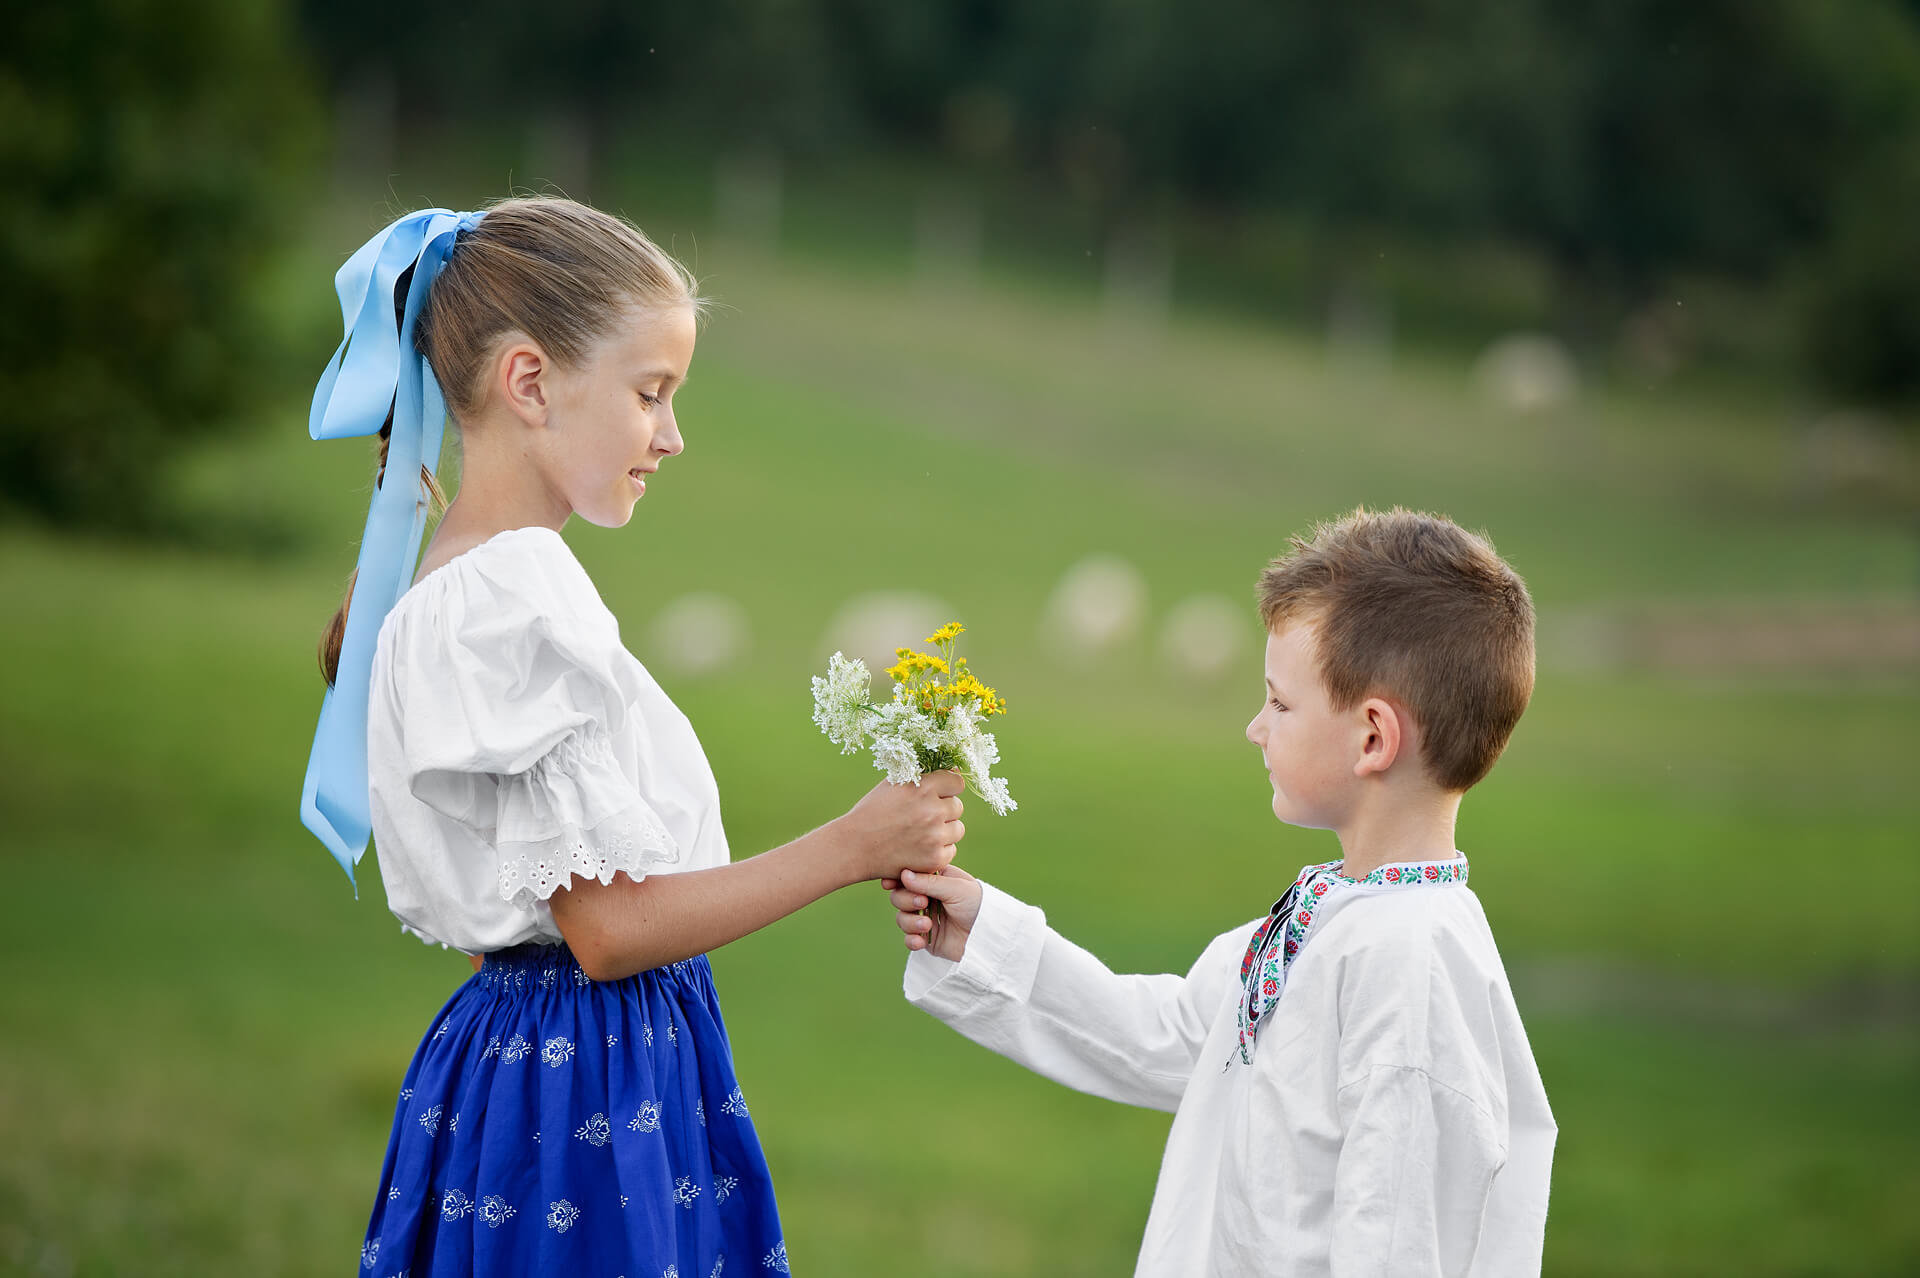 profesionalny fotograf Peter Norulak Kosice umelecke fotky deti surodenci exterier_11